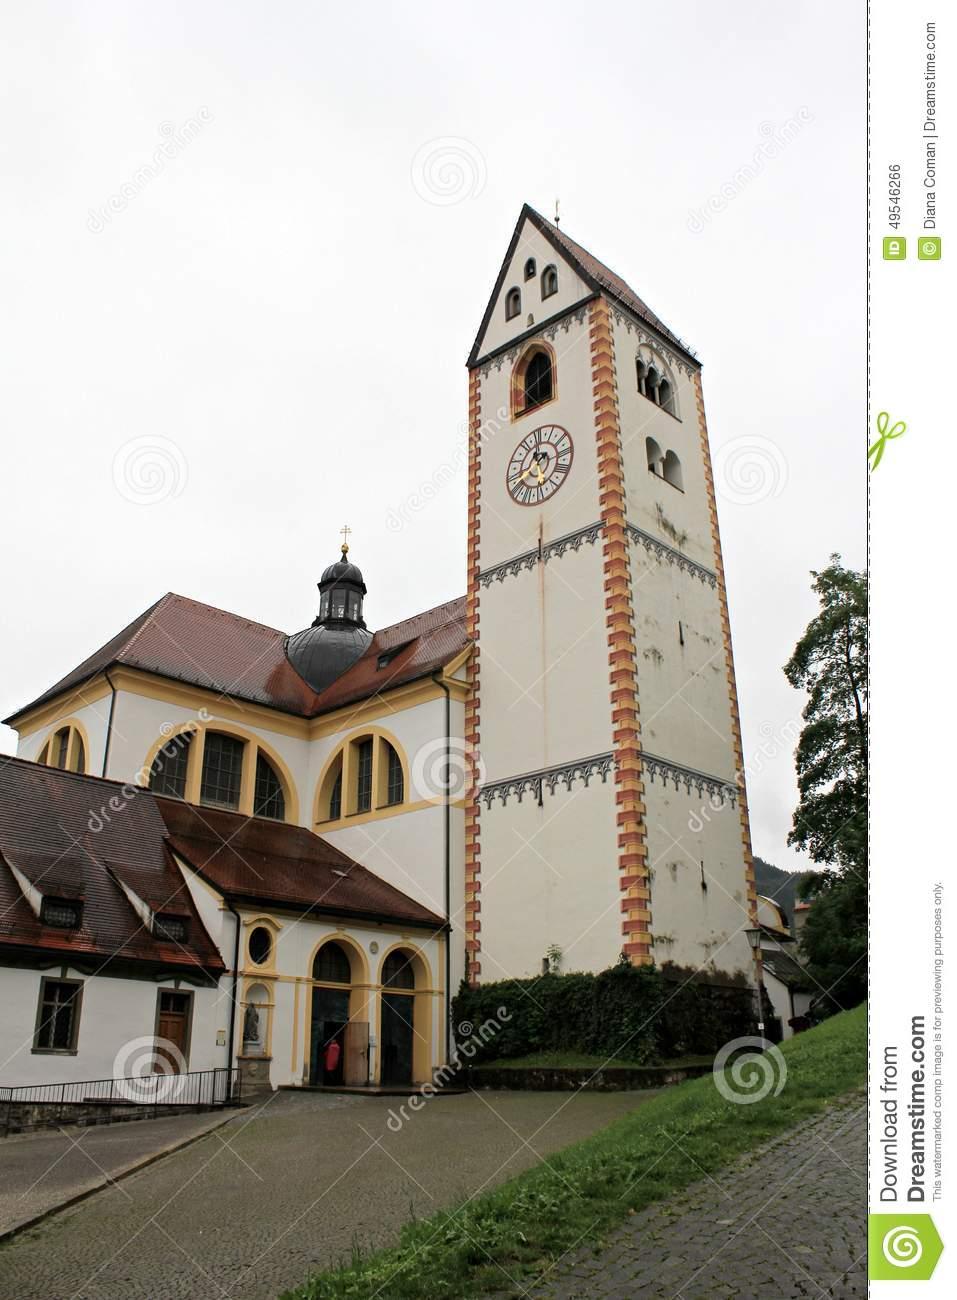 St. Mang Abbey, Fussen Stock Photo.